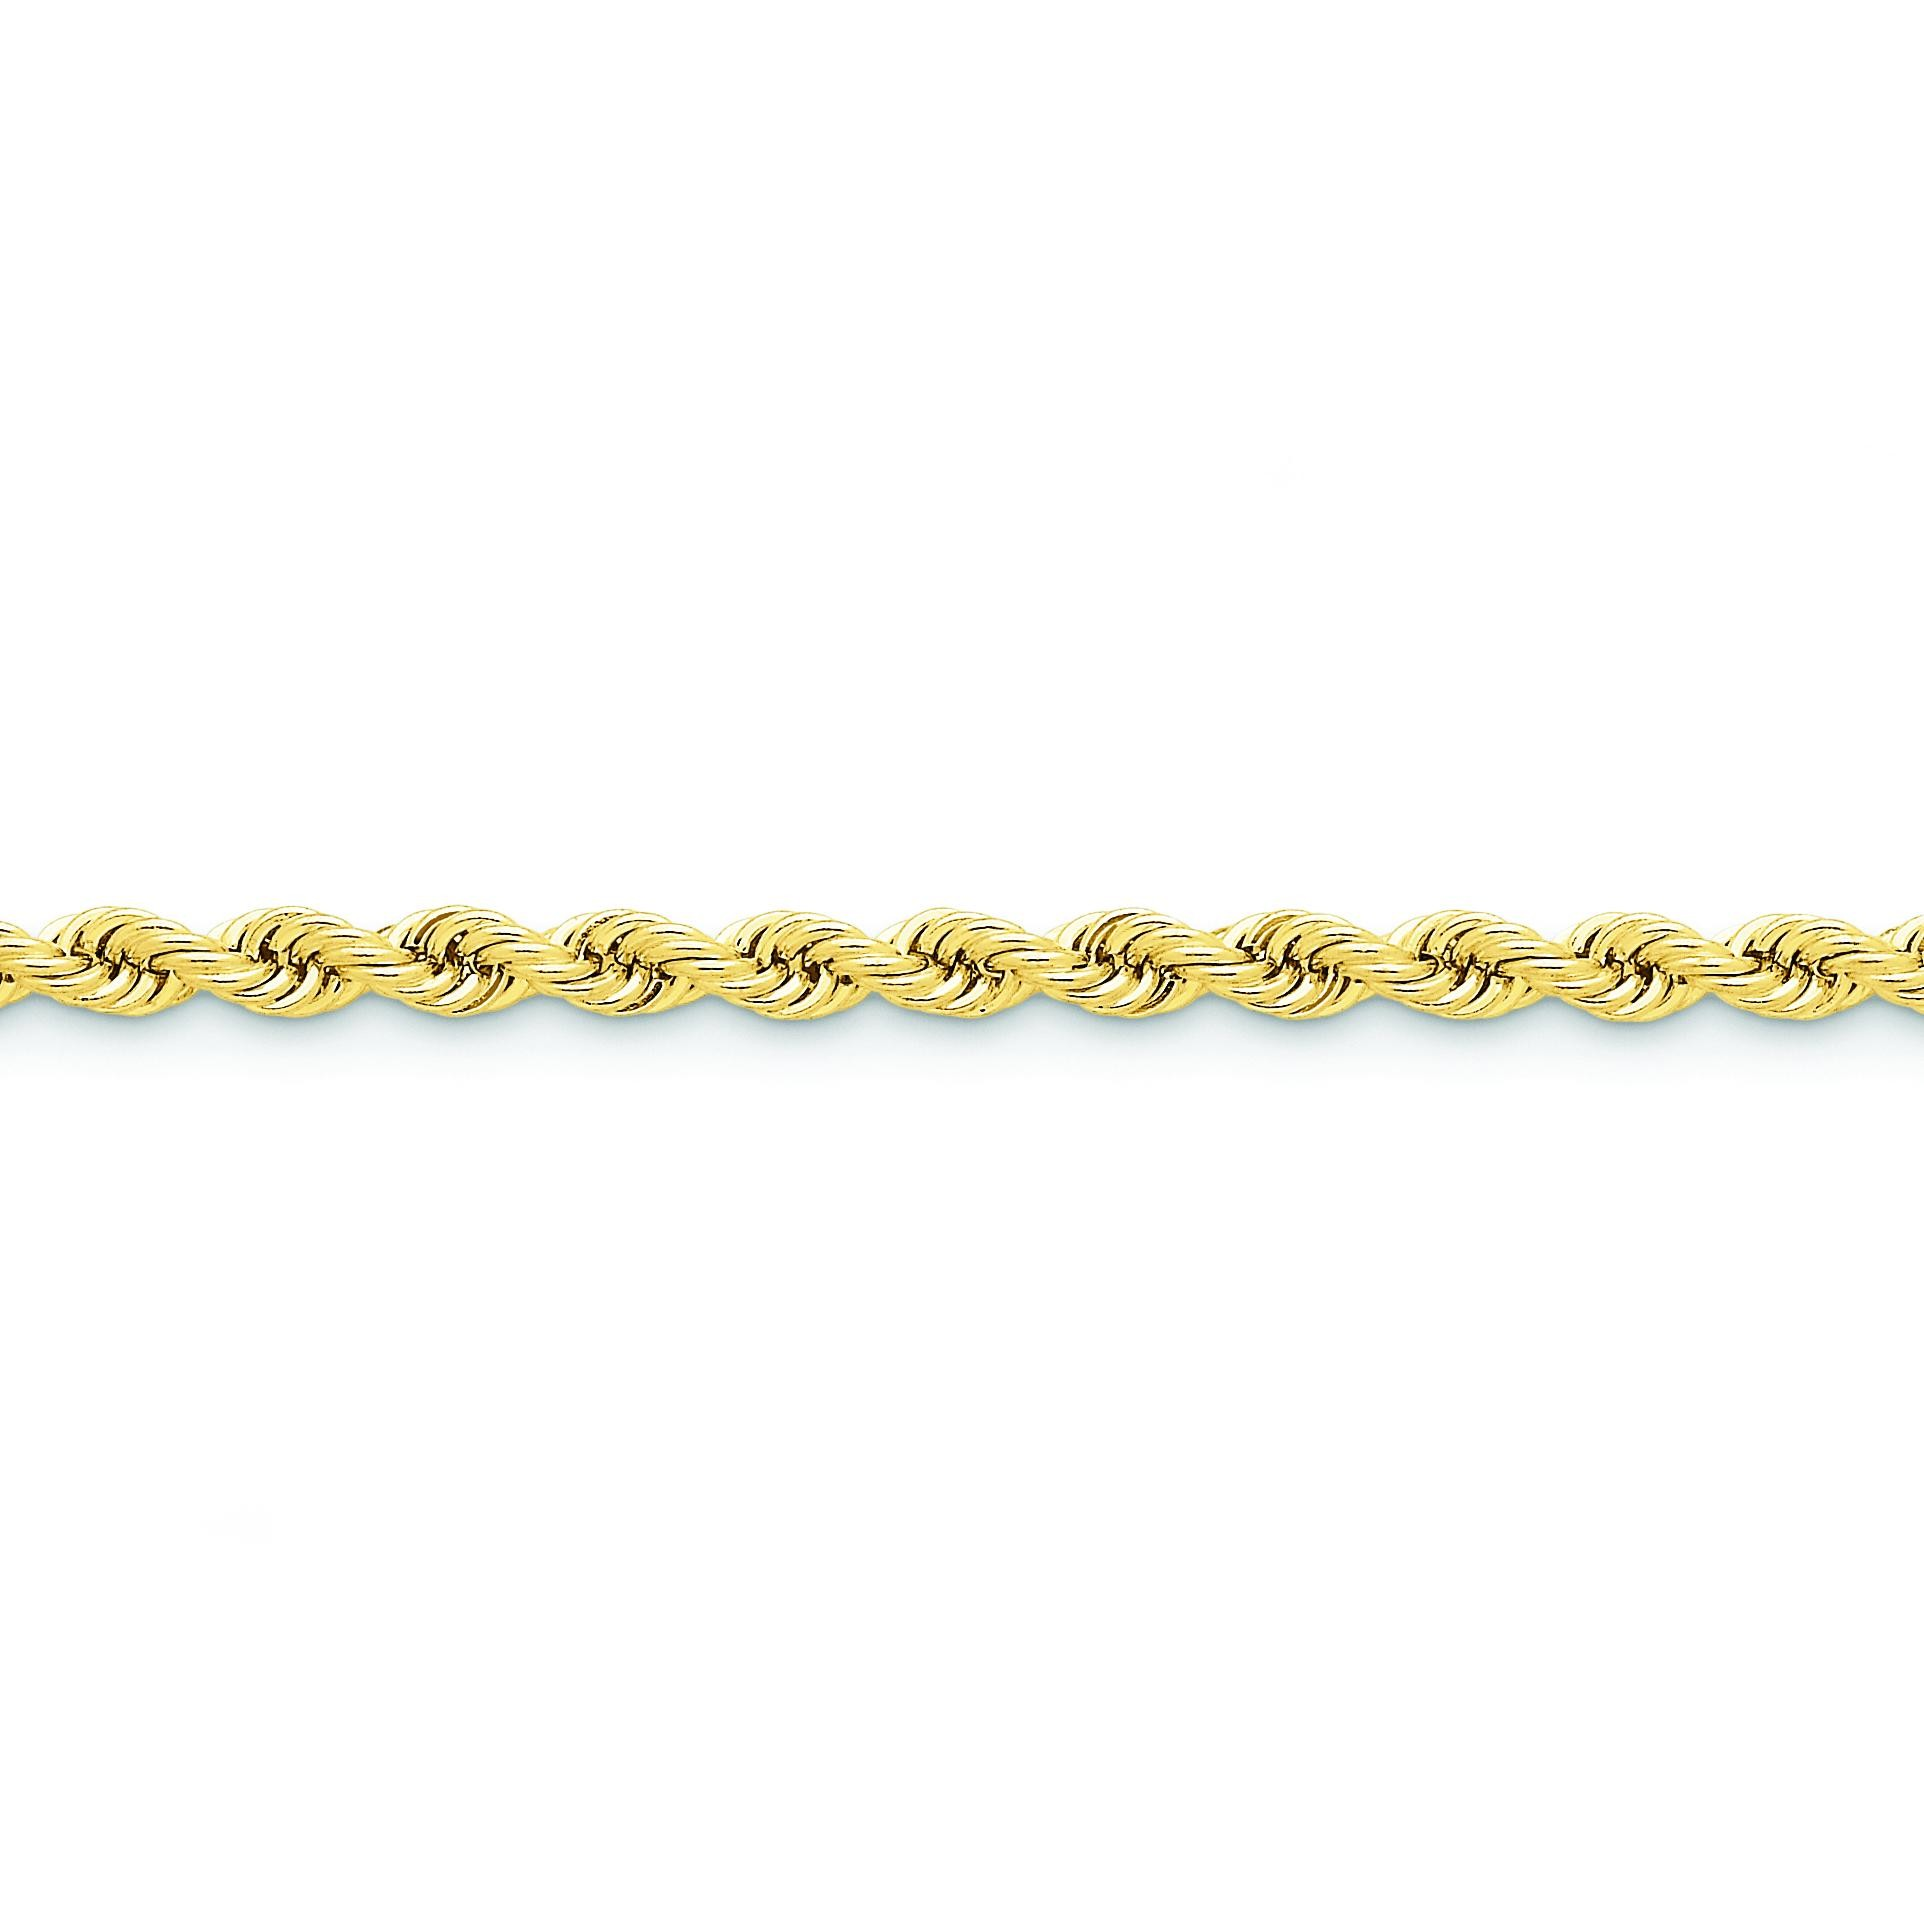 14k Yellow Gold 8 inch 5.00 mm Handmade Regular Rope Chain Bracelet